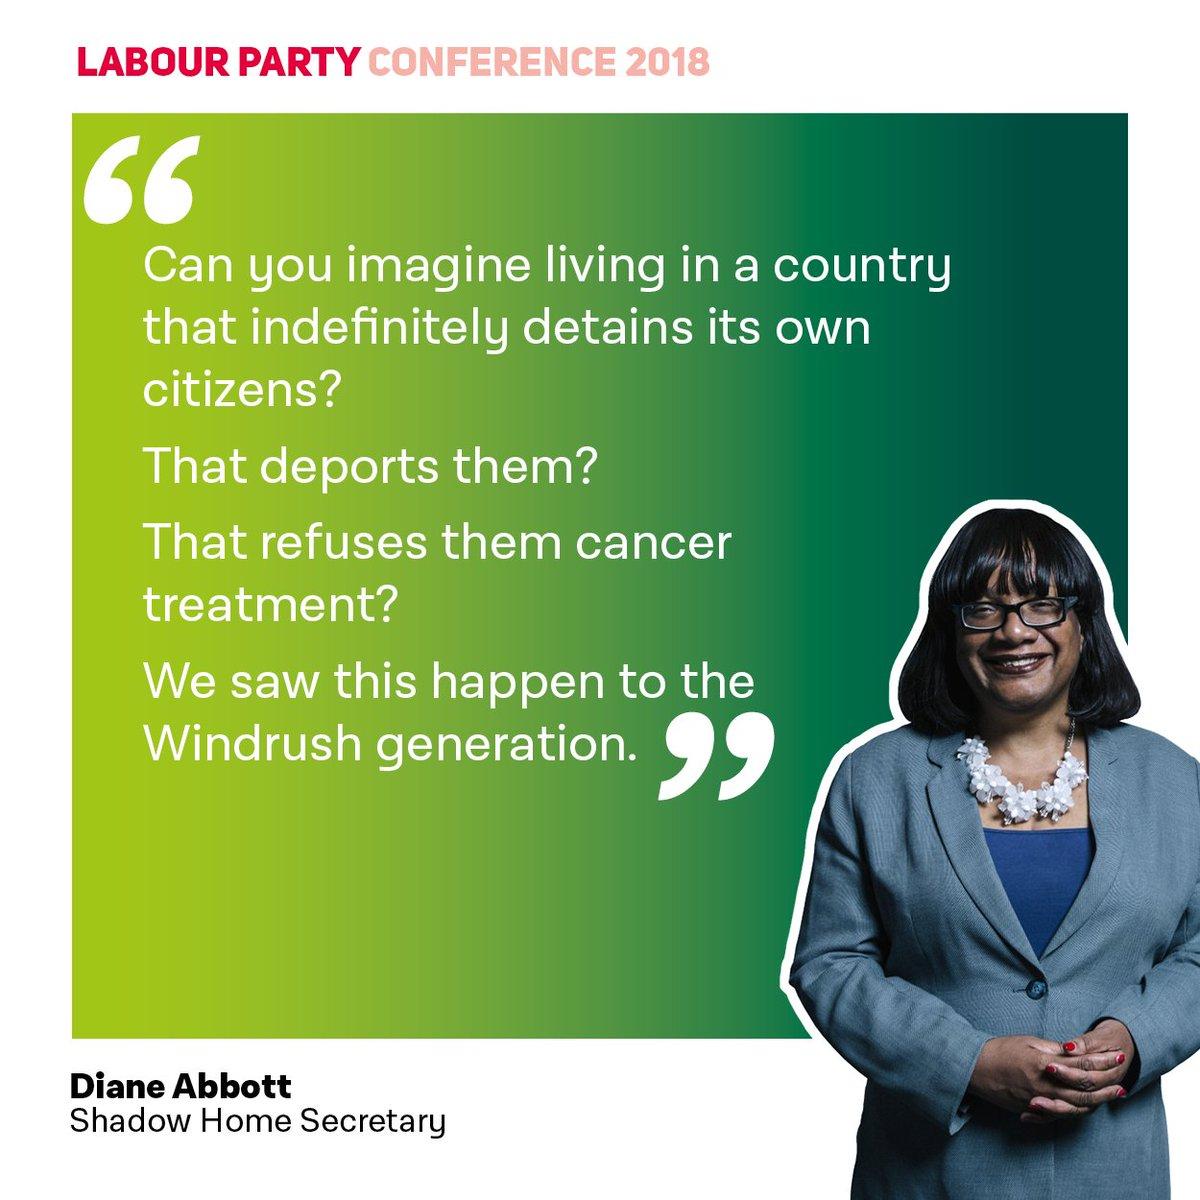 📣 The Tories' treatment of the Windrush Generation 👇 @HackneyAbbott #Lab18